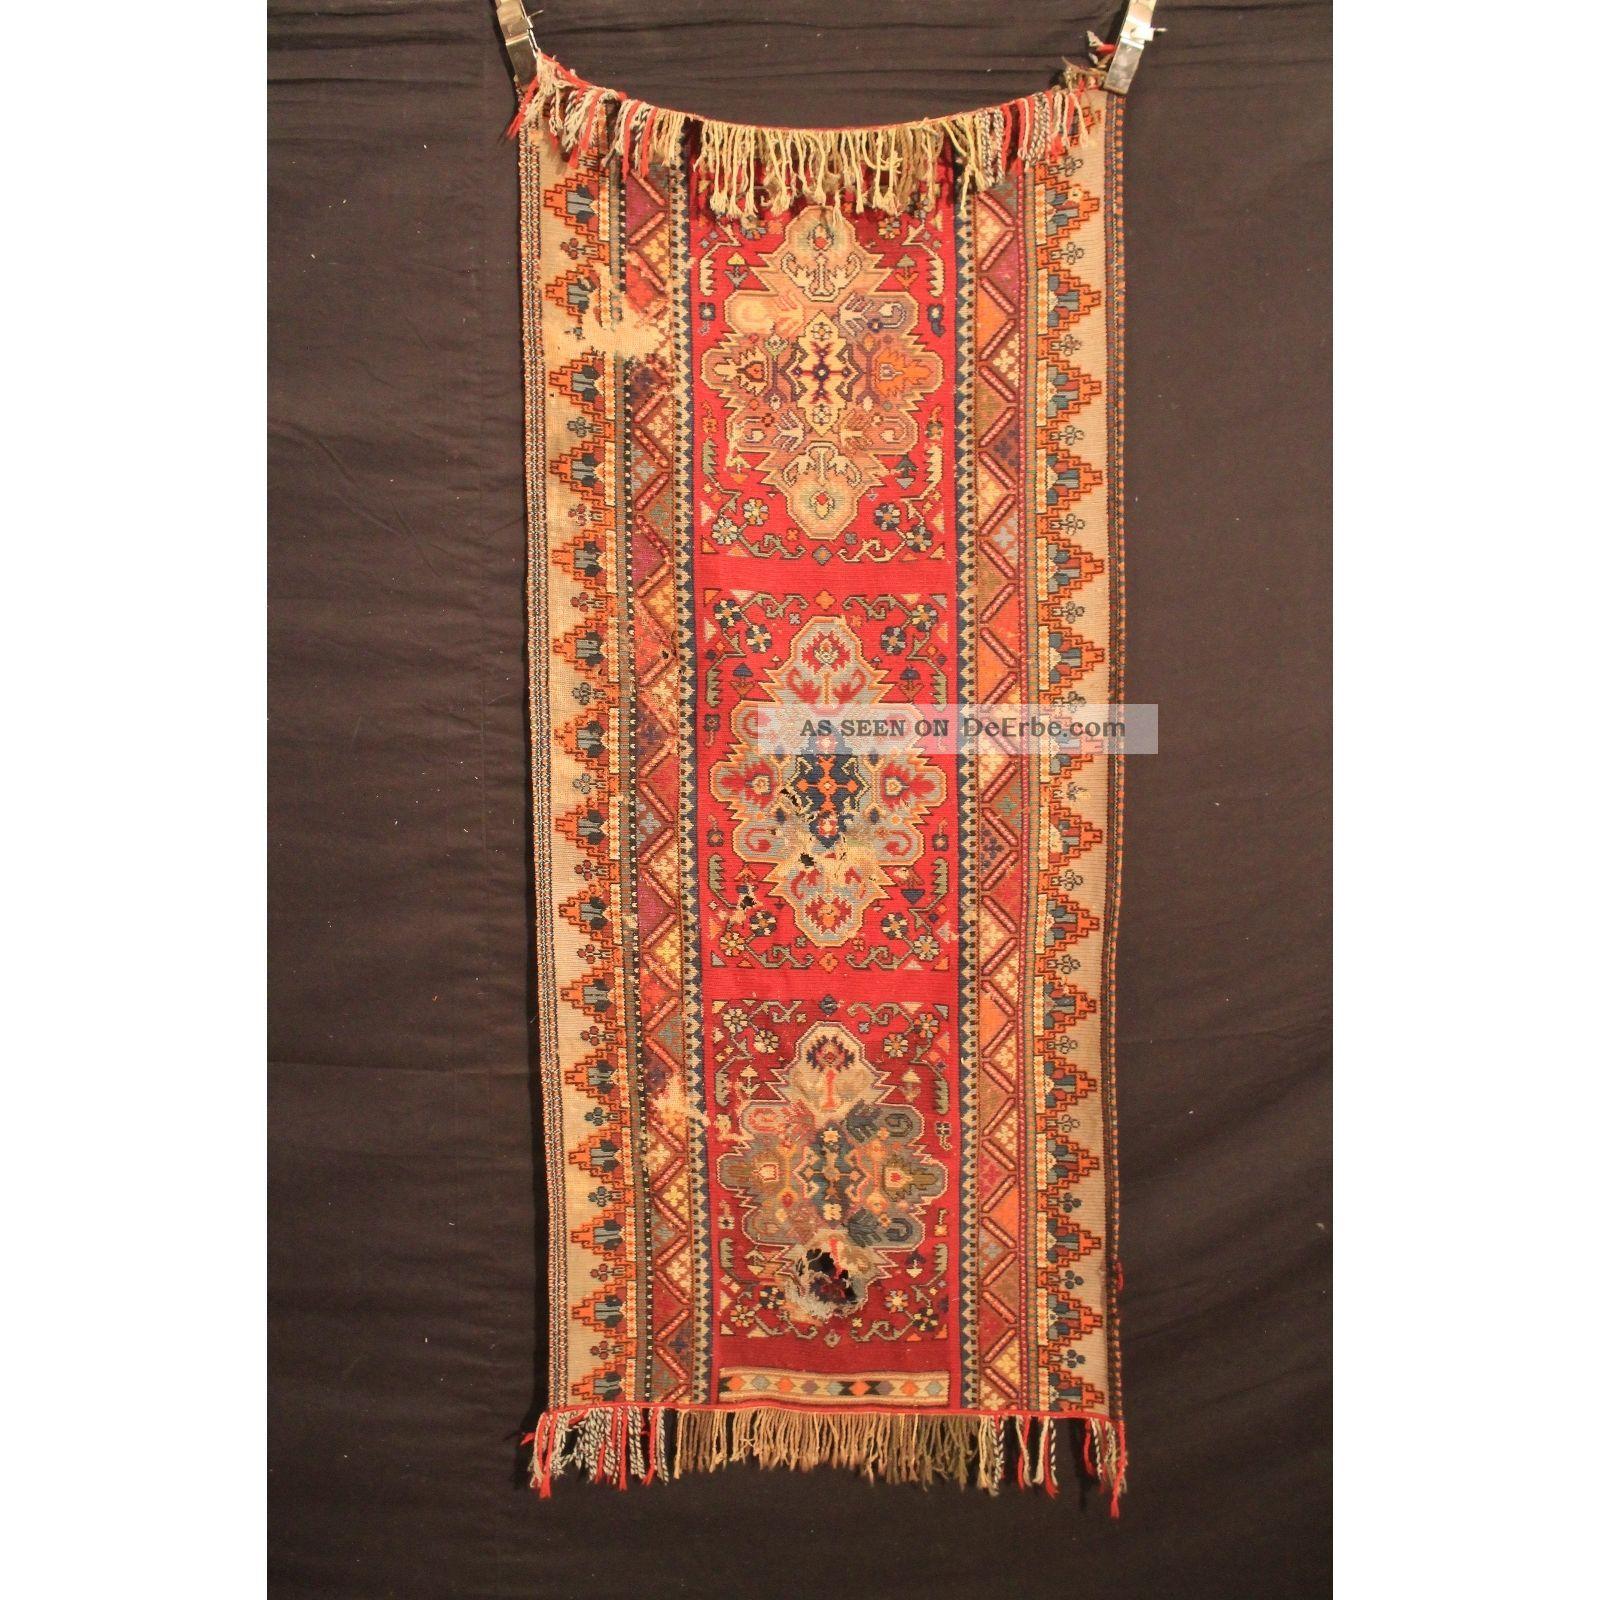 Alt Gewebter Orient Teppich Kilim Kelim Kazak Carpet Tapis Rug 165x65cm Vintage Teppiche & Flachgewebe Bild